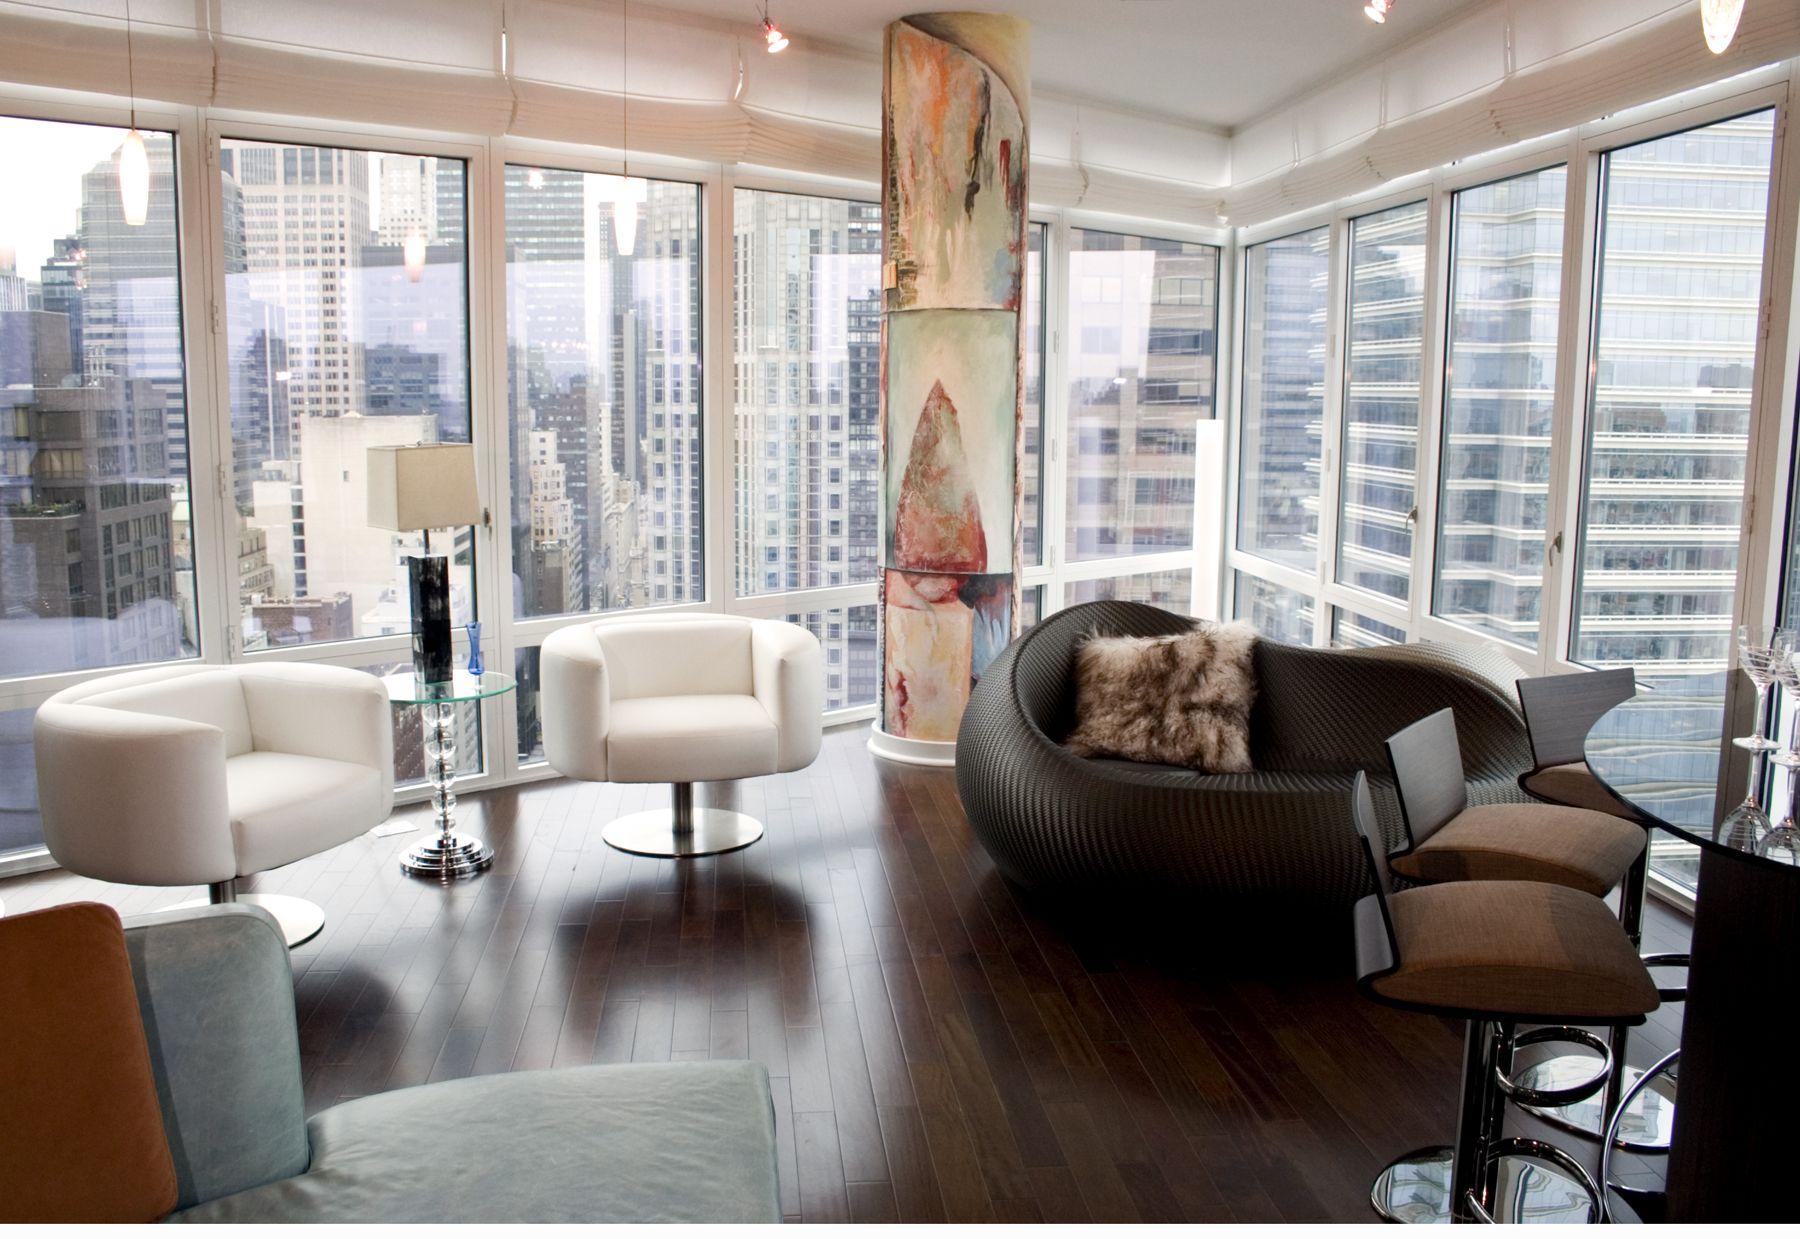 4 bedroom loft  Huge Loft Living Room at East th Street  Bedroom home